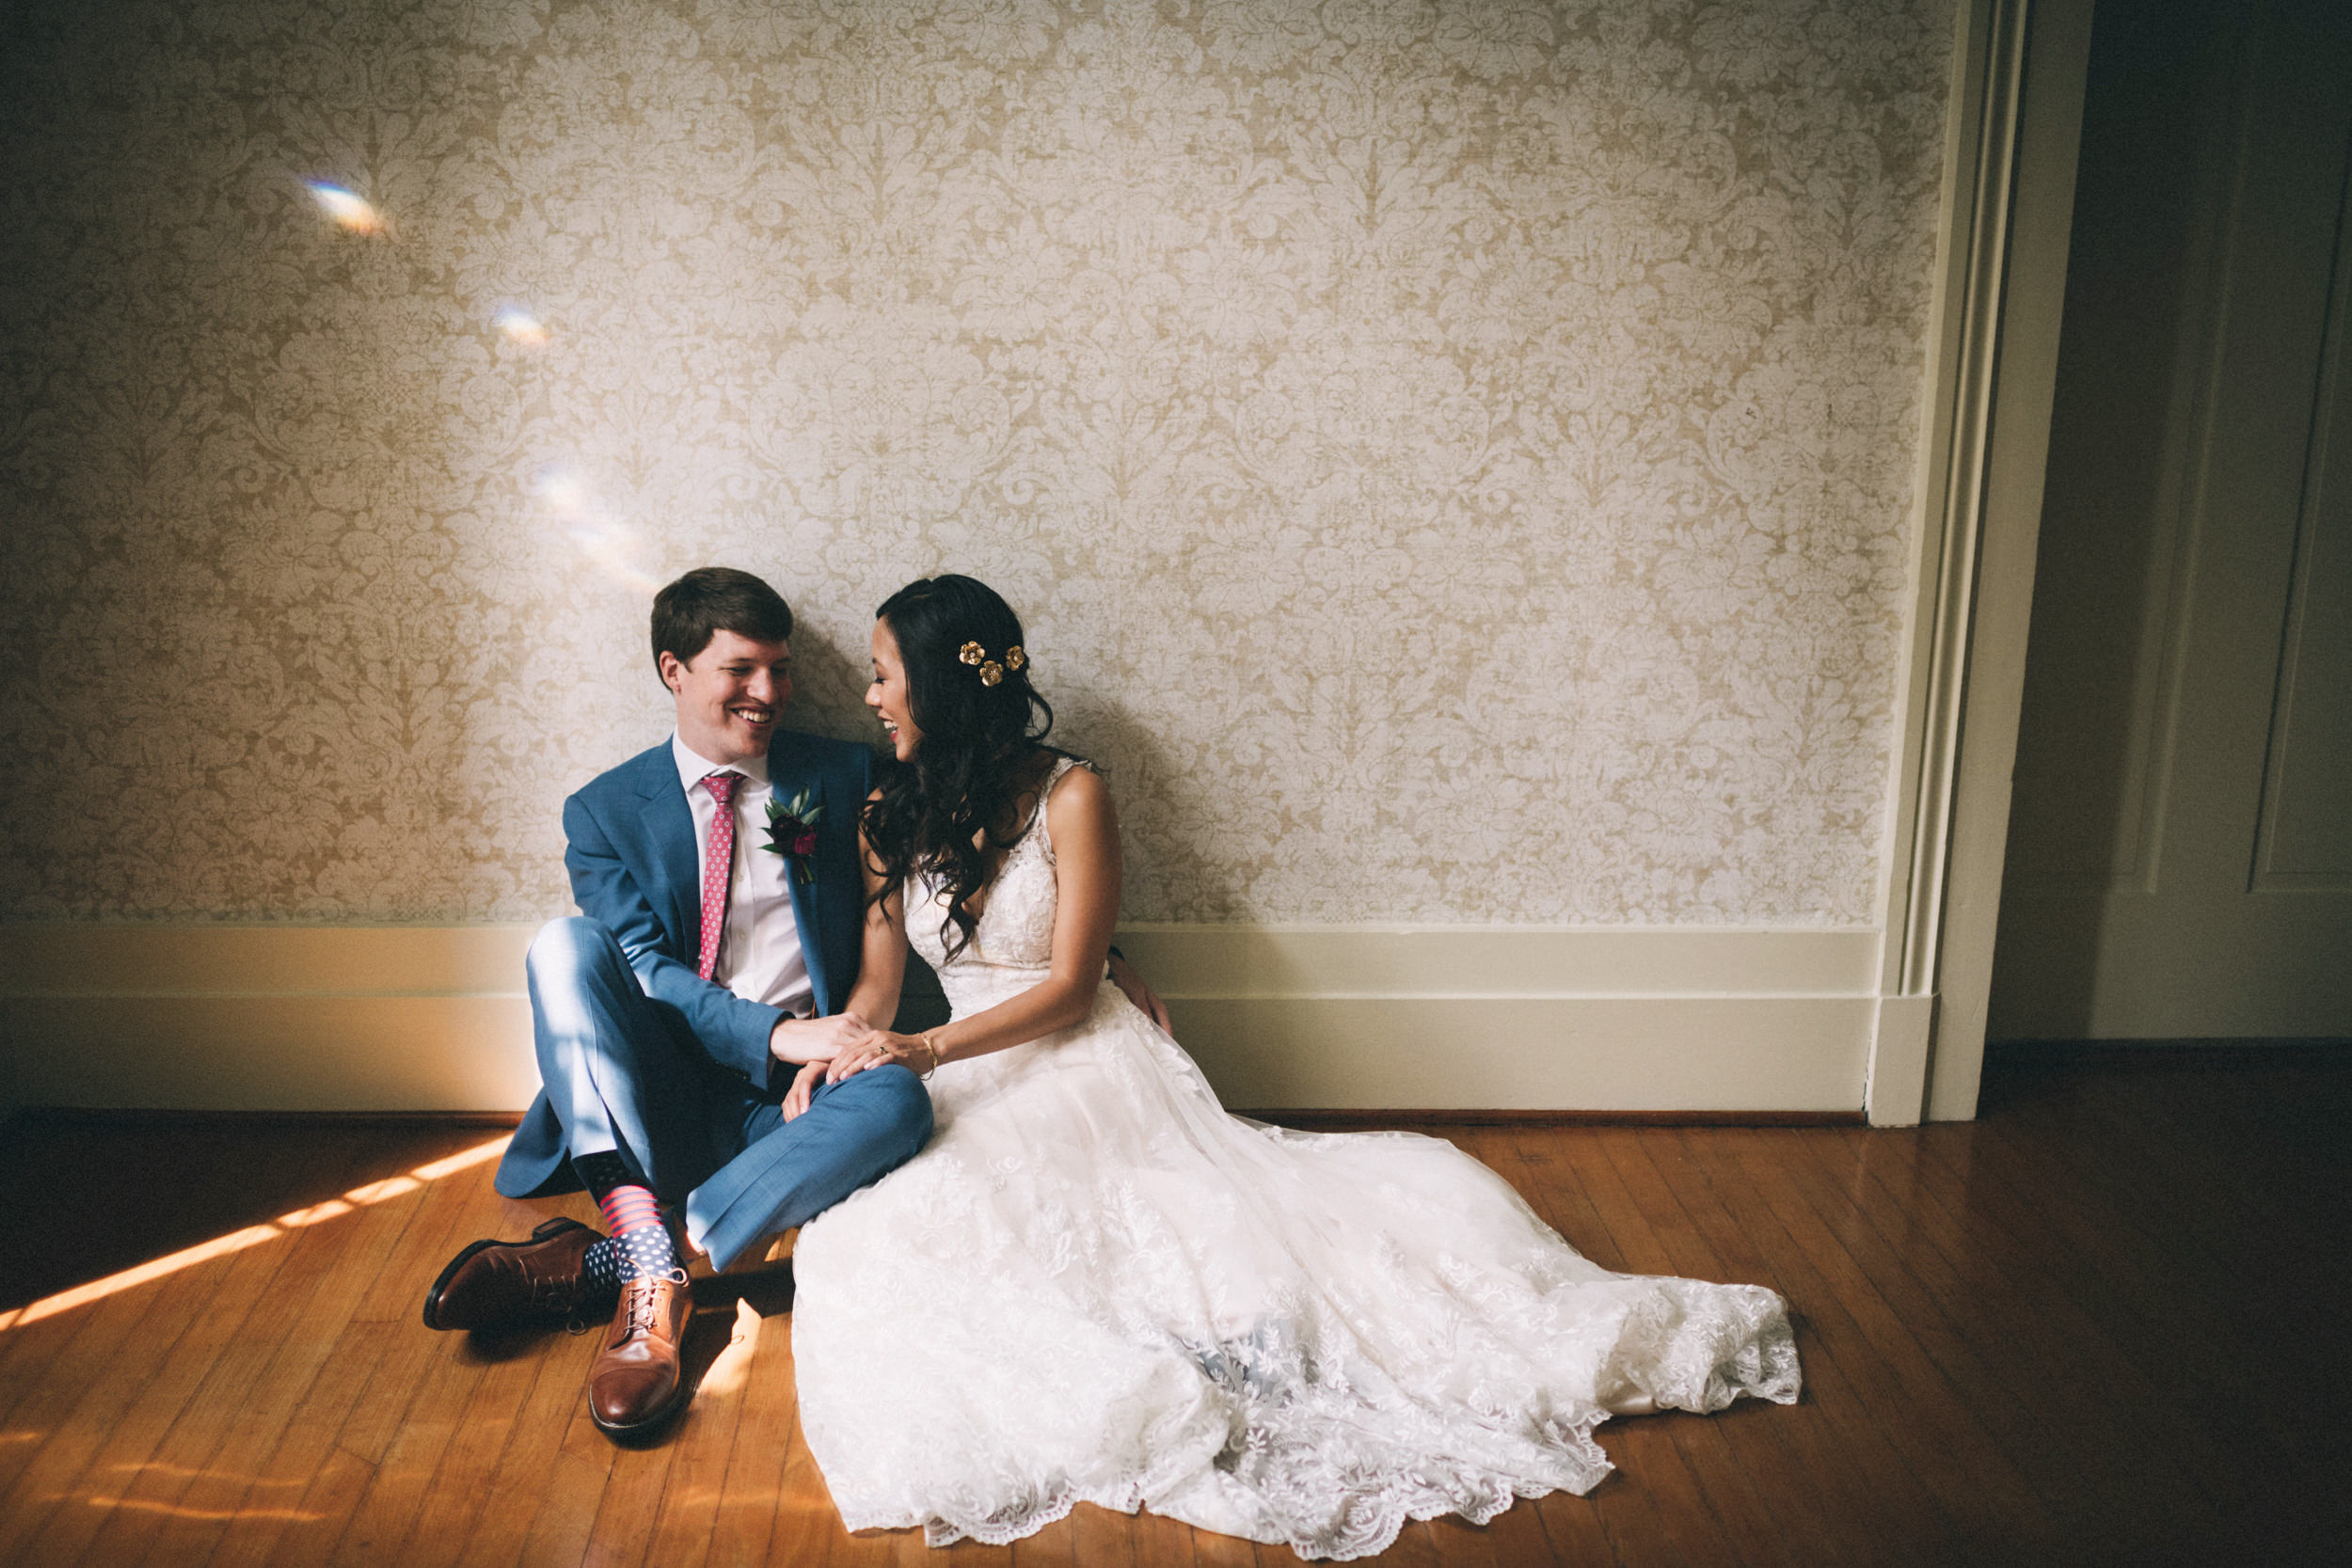 Louisville-Kentucky-Wedding-and-Elopement-Photographer-Sarah-Katherine-Davis-Photography-Summer-Jewel-Toned-Wedding-Chineese-Tea-Ceremony-Warrenwood-Manor-Danville-226.jpg